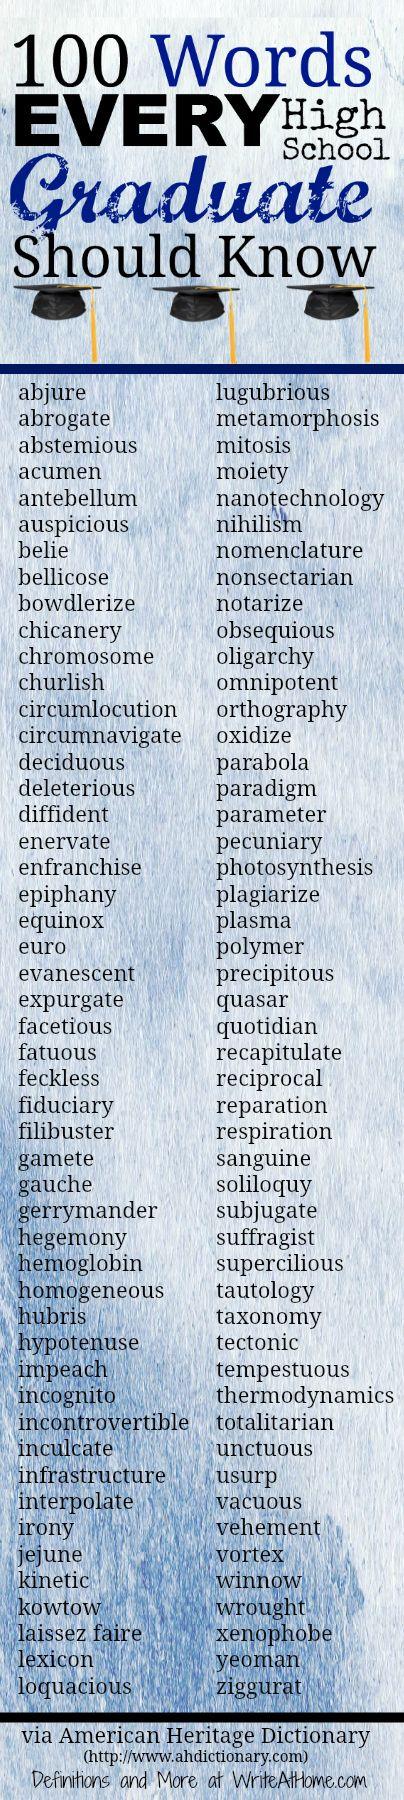 100 Words Every High School Graduate Should Know via